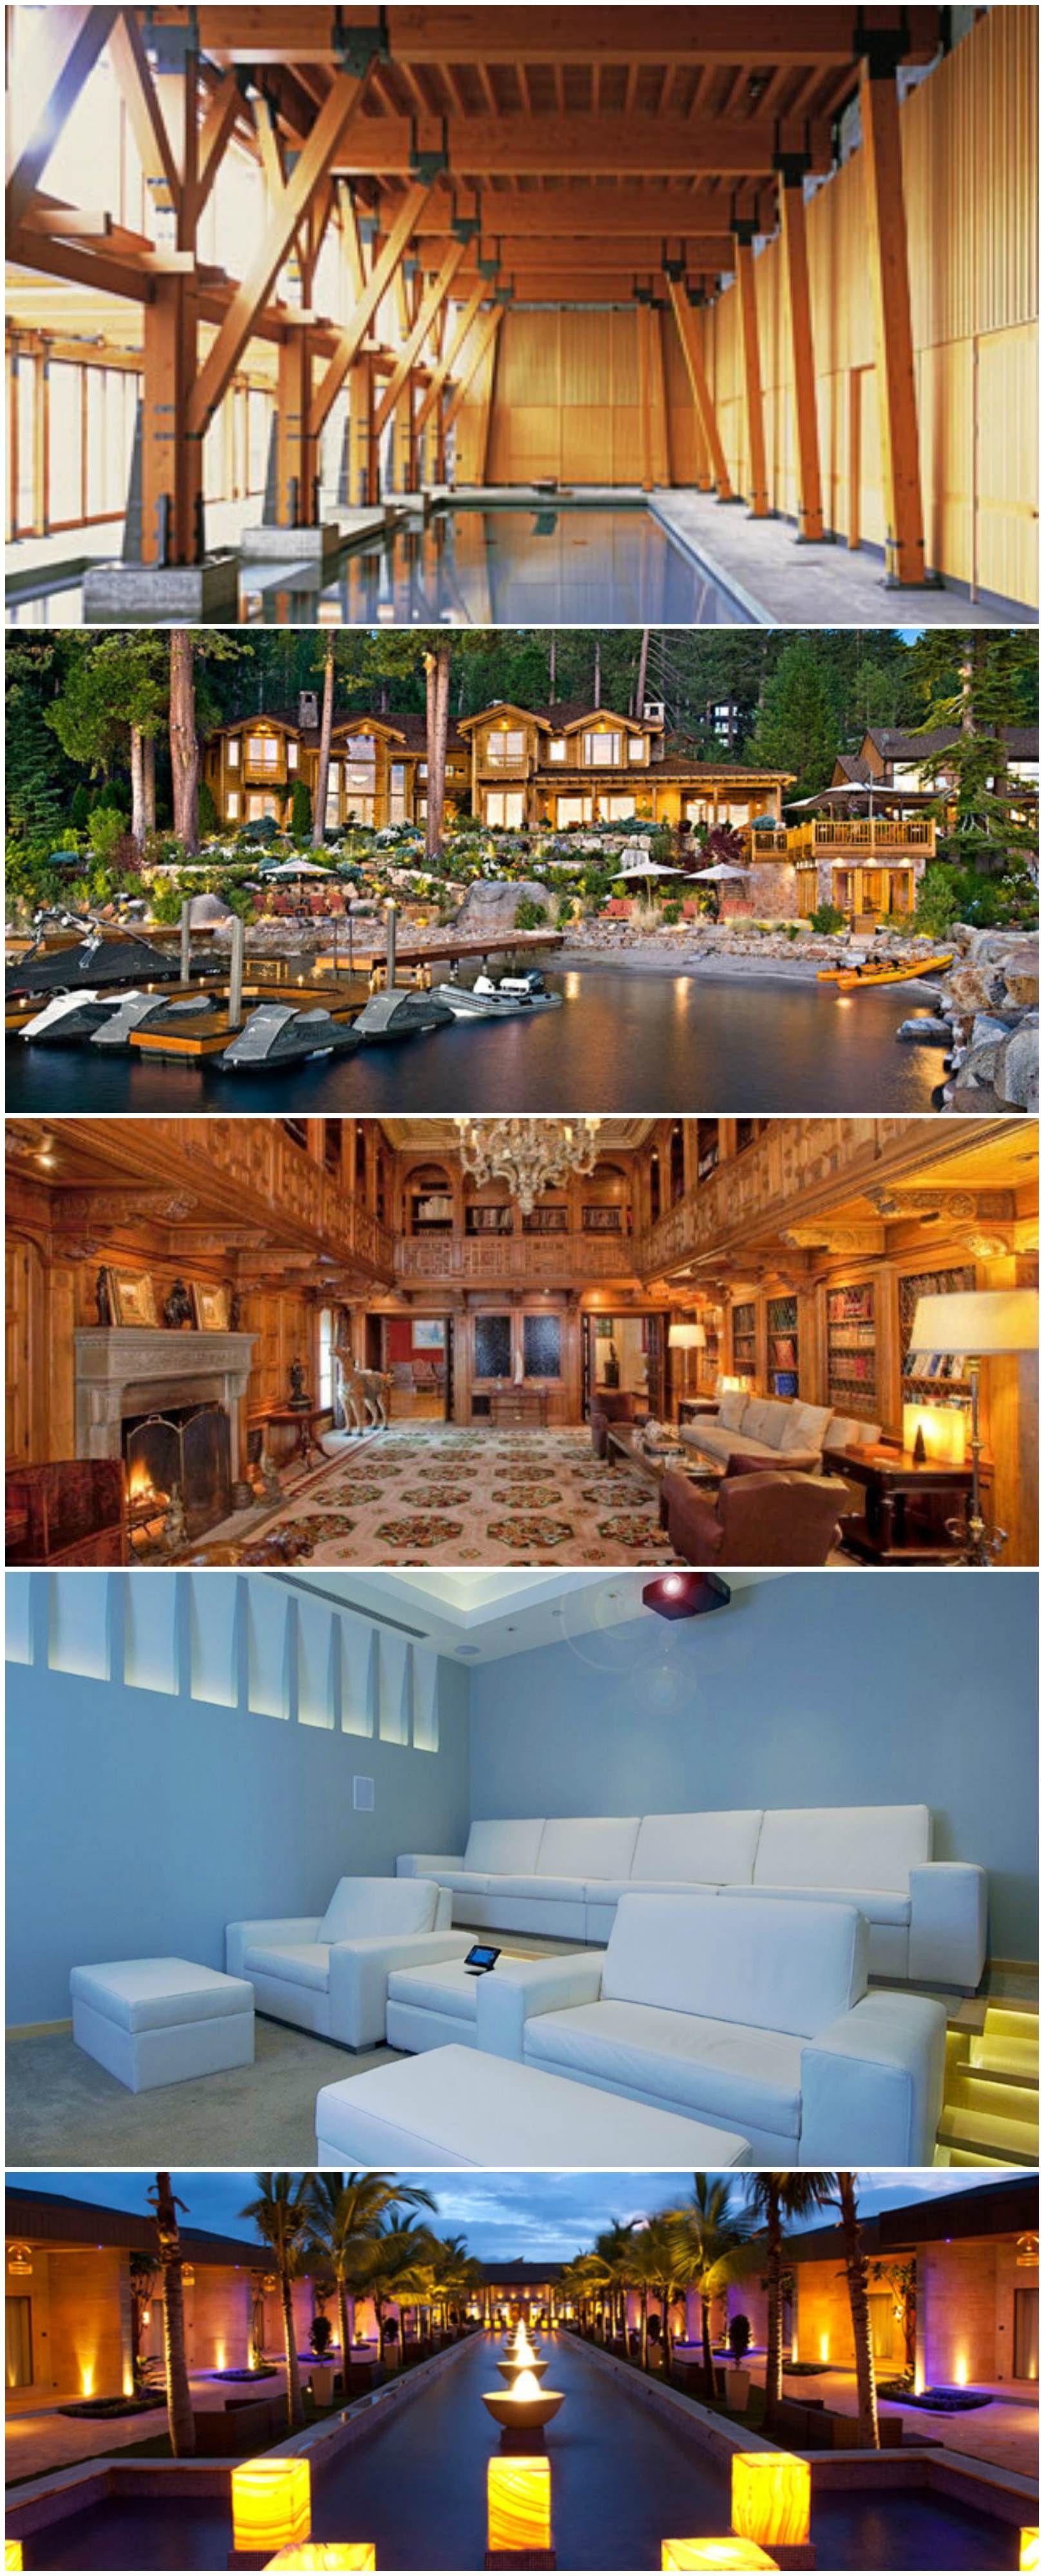 Luxurious House Of Bill Gates Xanadu 2.0